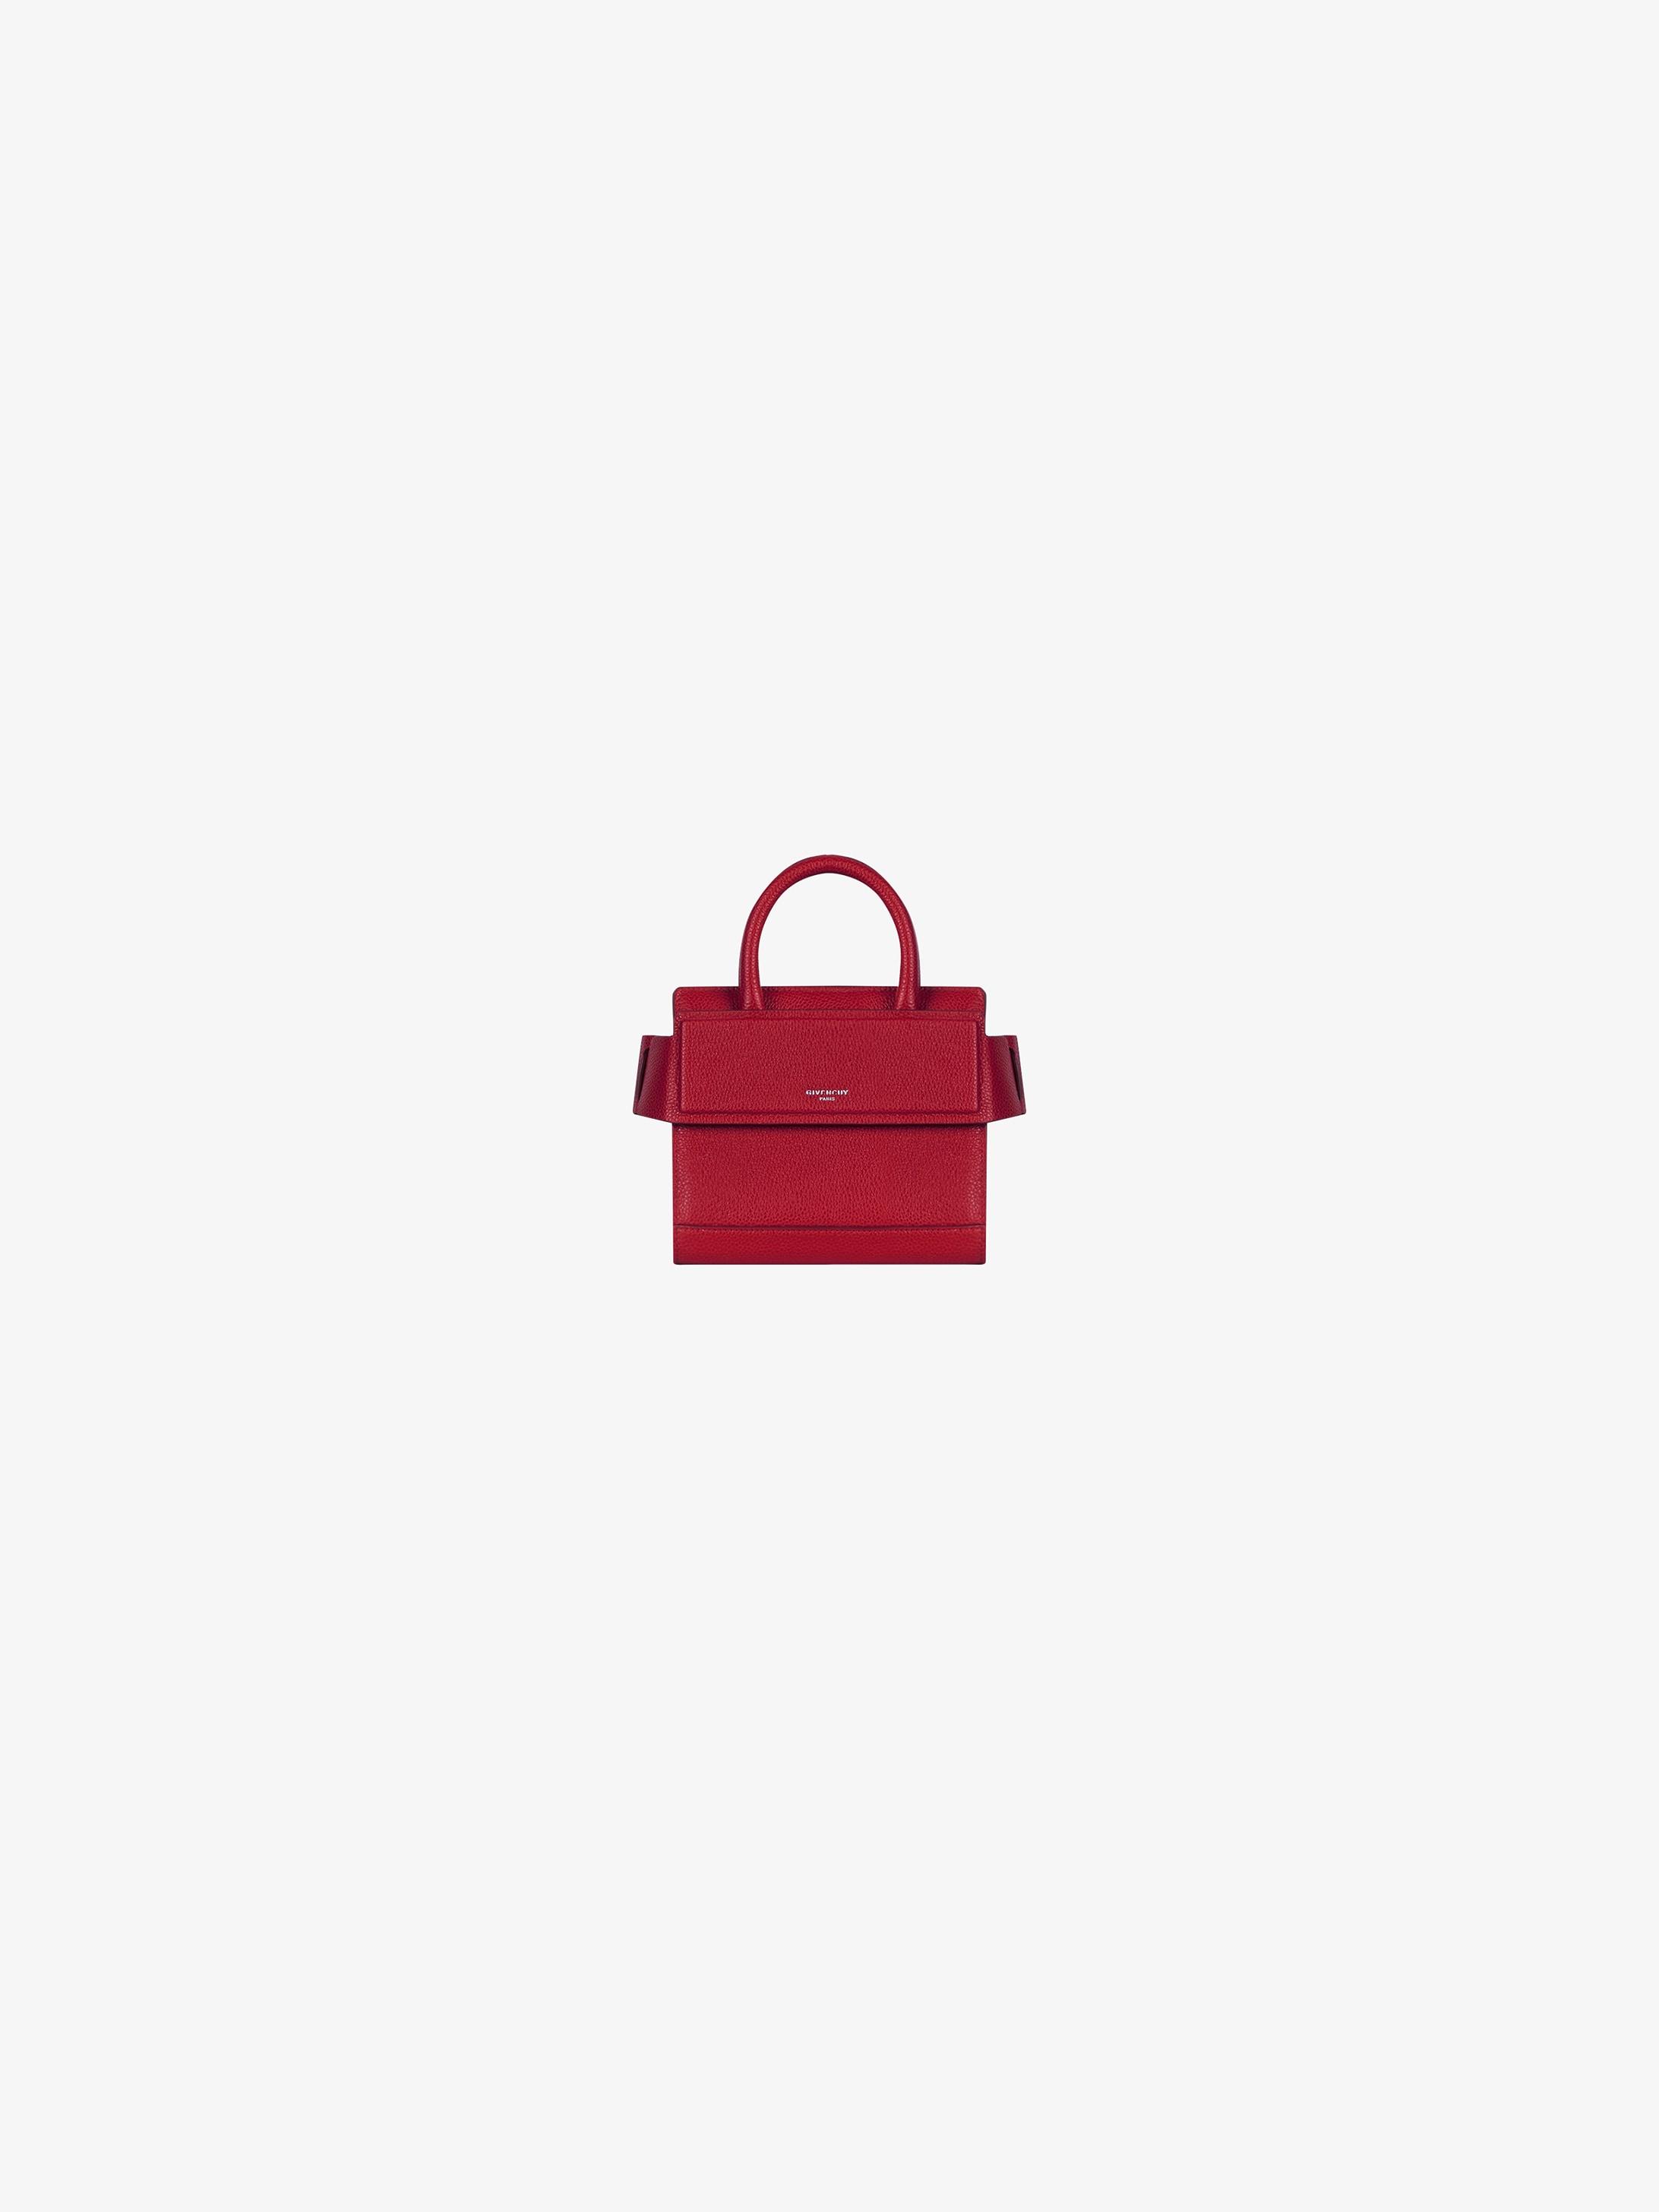 Nano Horizon bag in grained leather